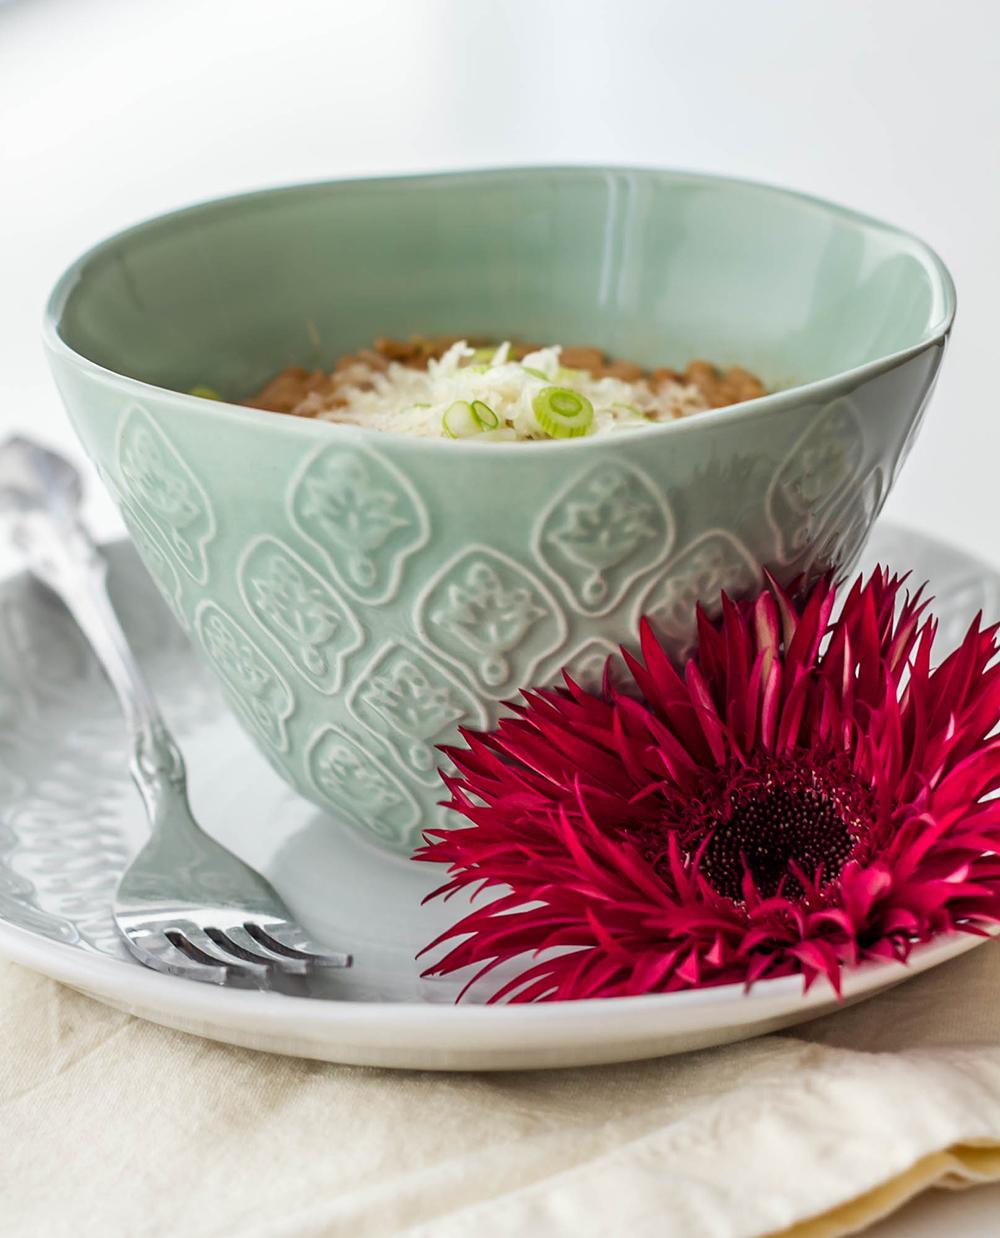 Pu-erh Tea and Gruyere Risotto